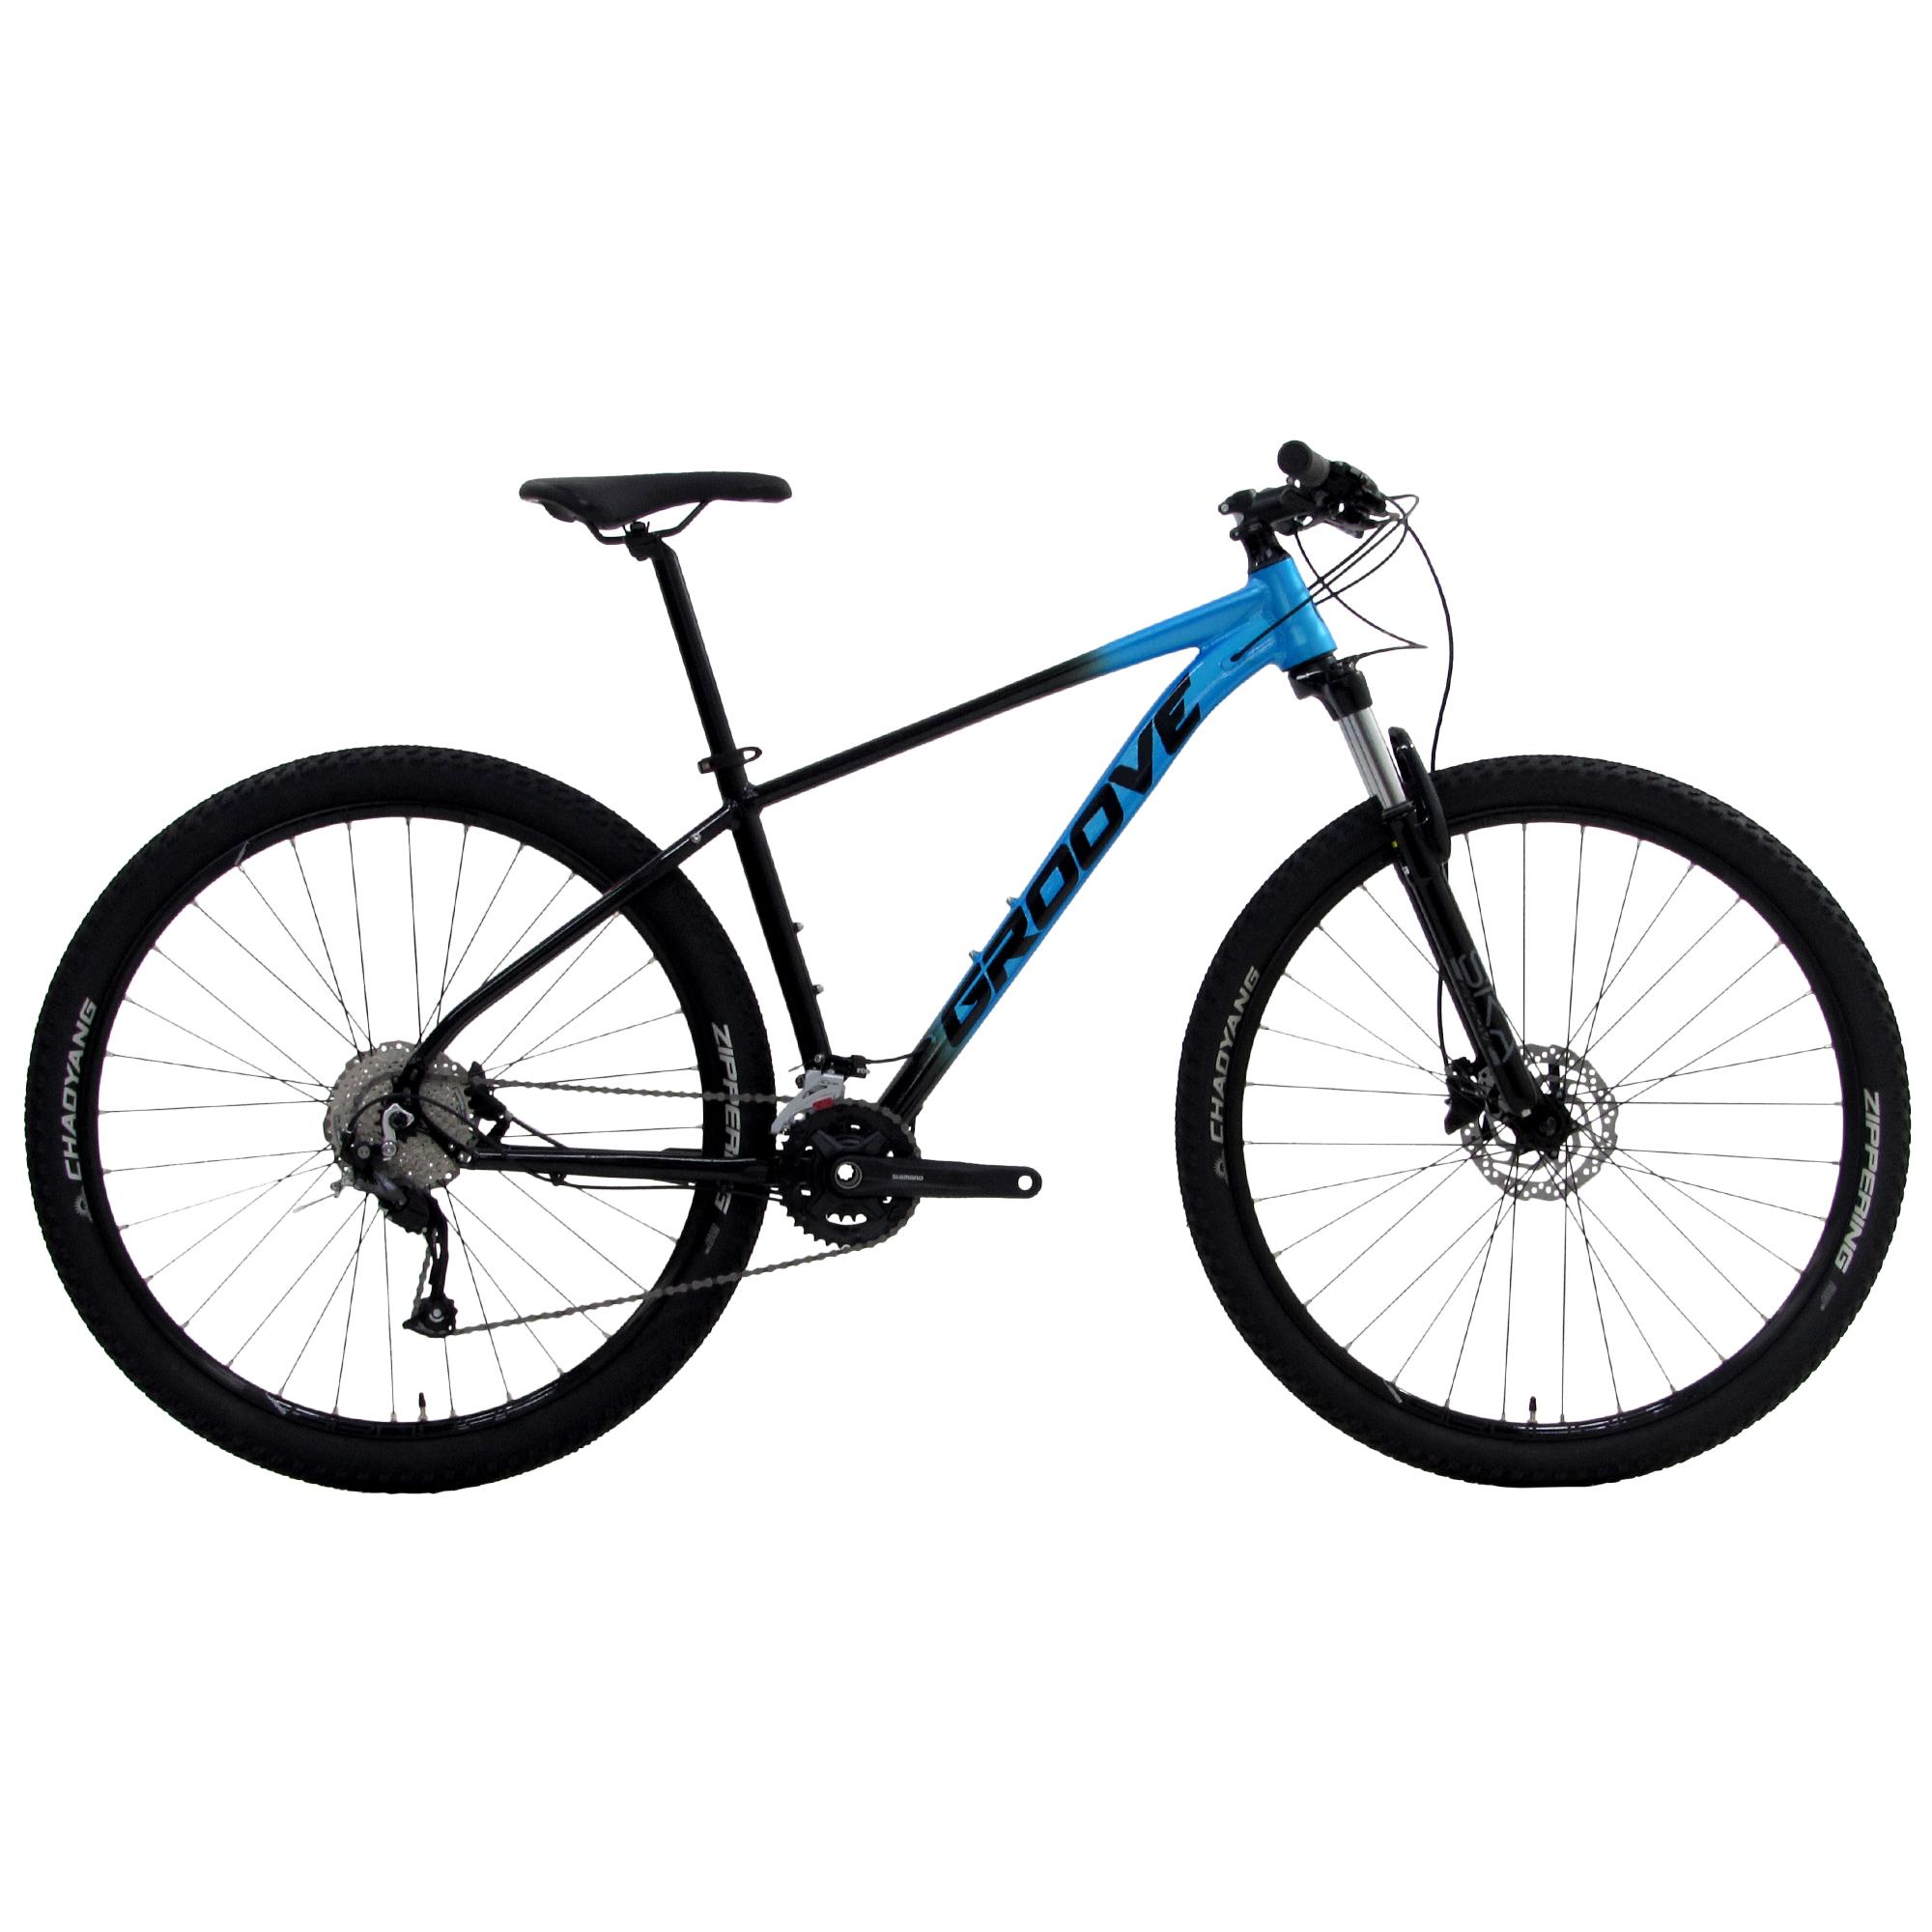 Bicicleta-Groove-Ska-30-1-01